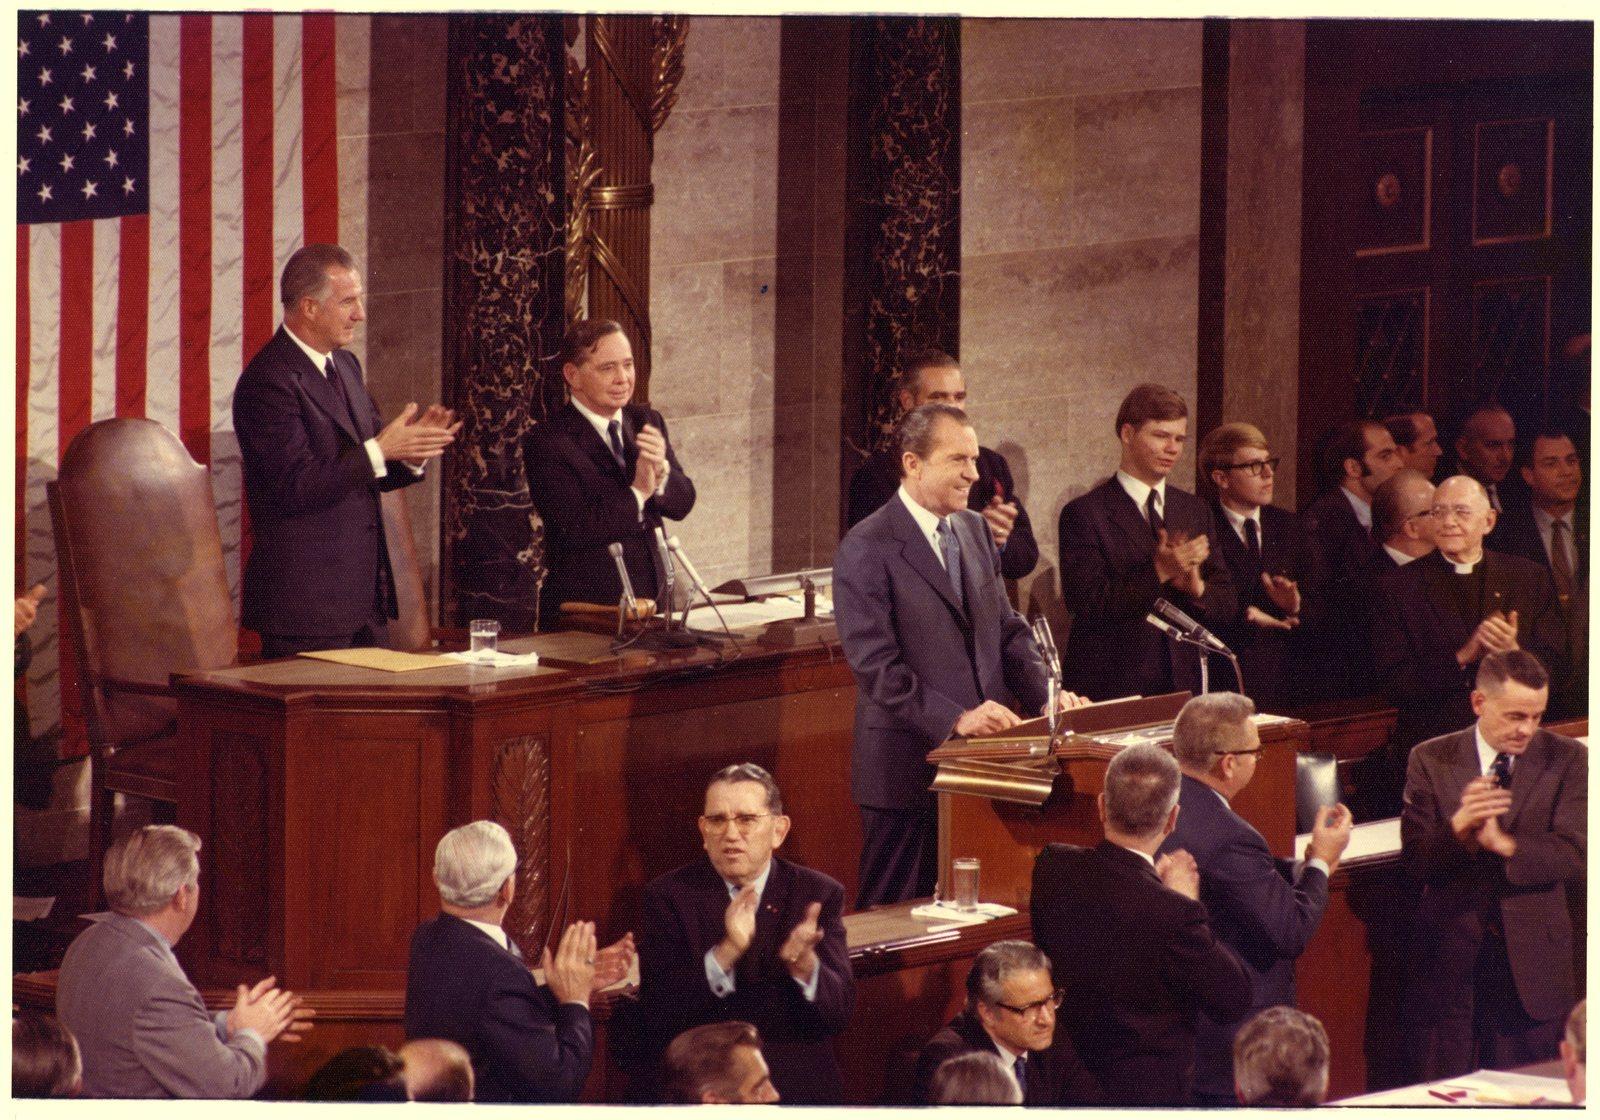 President Richard Nixon Making the State of the Union Address